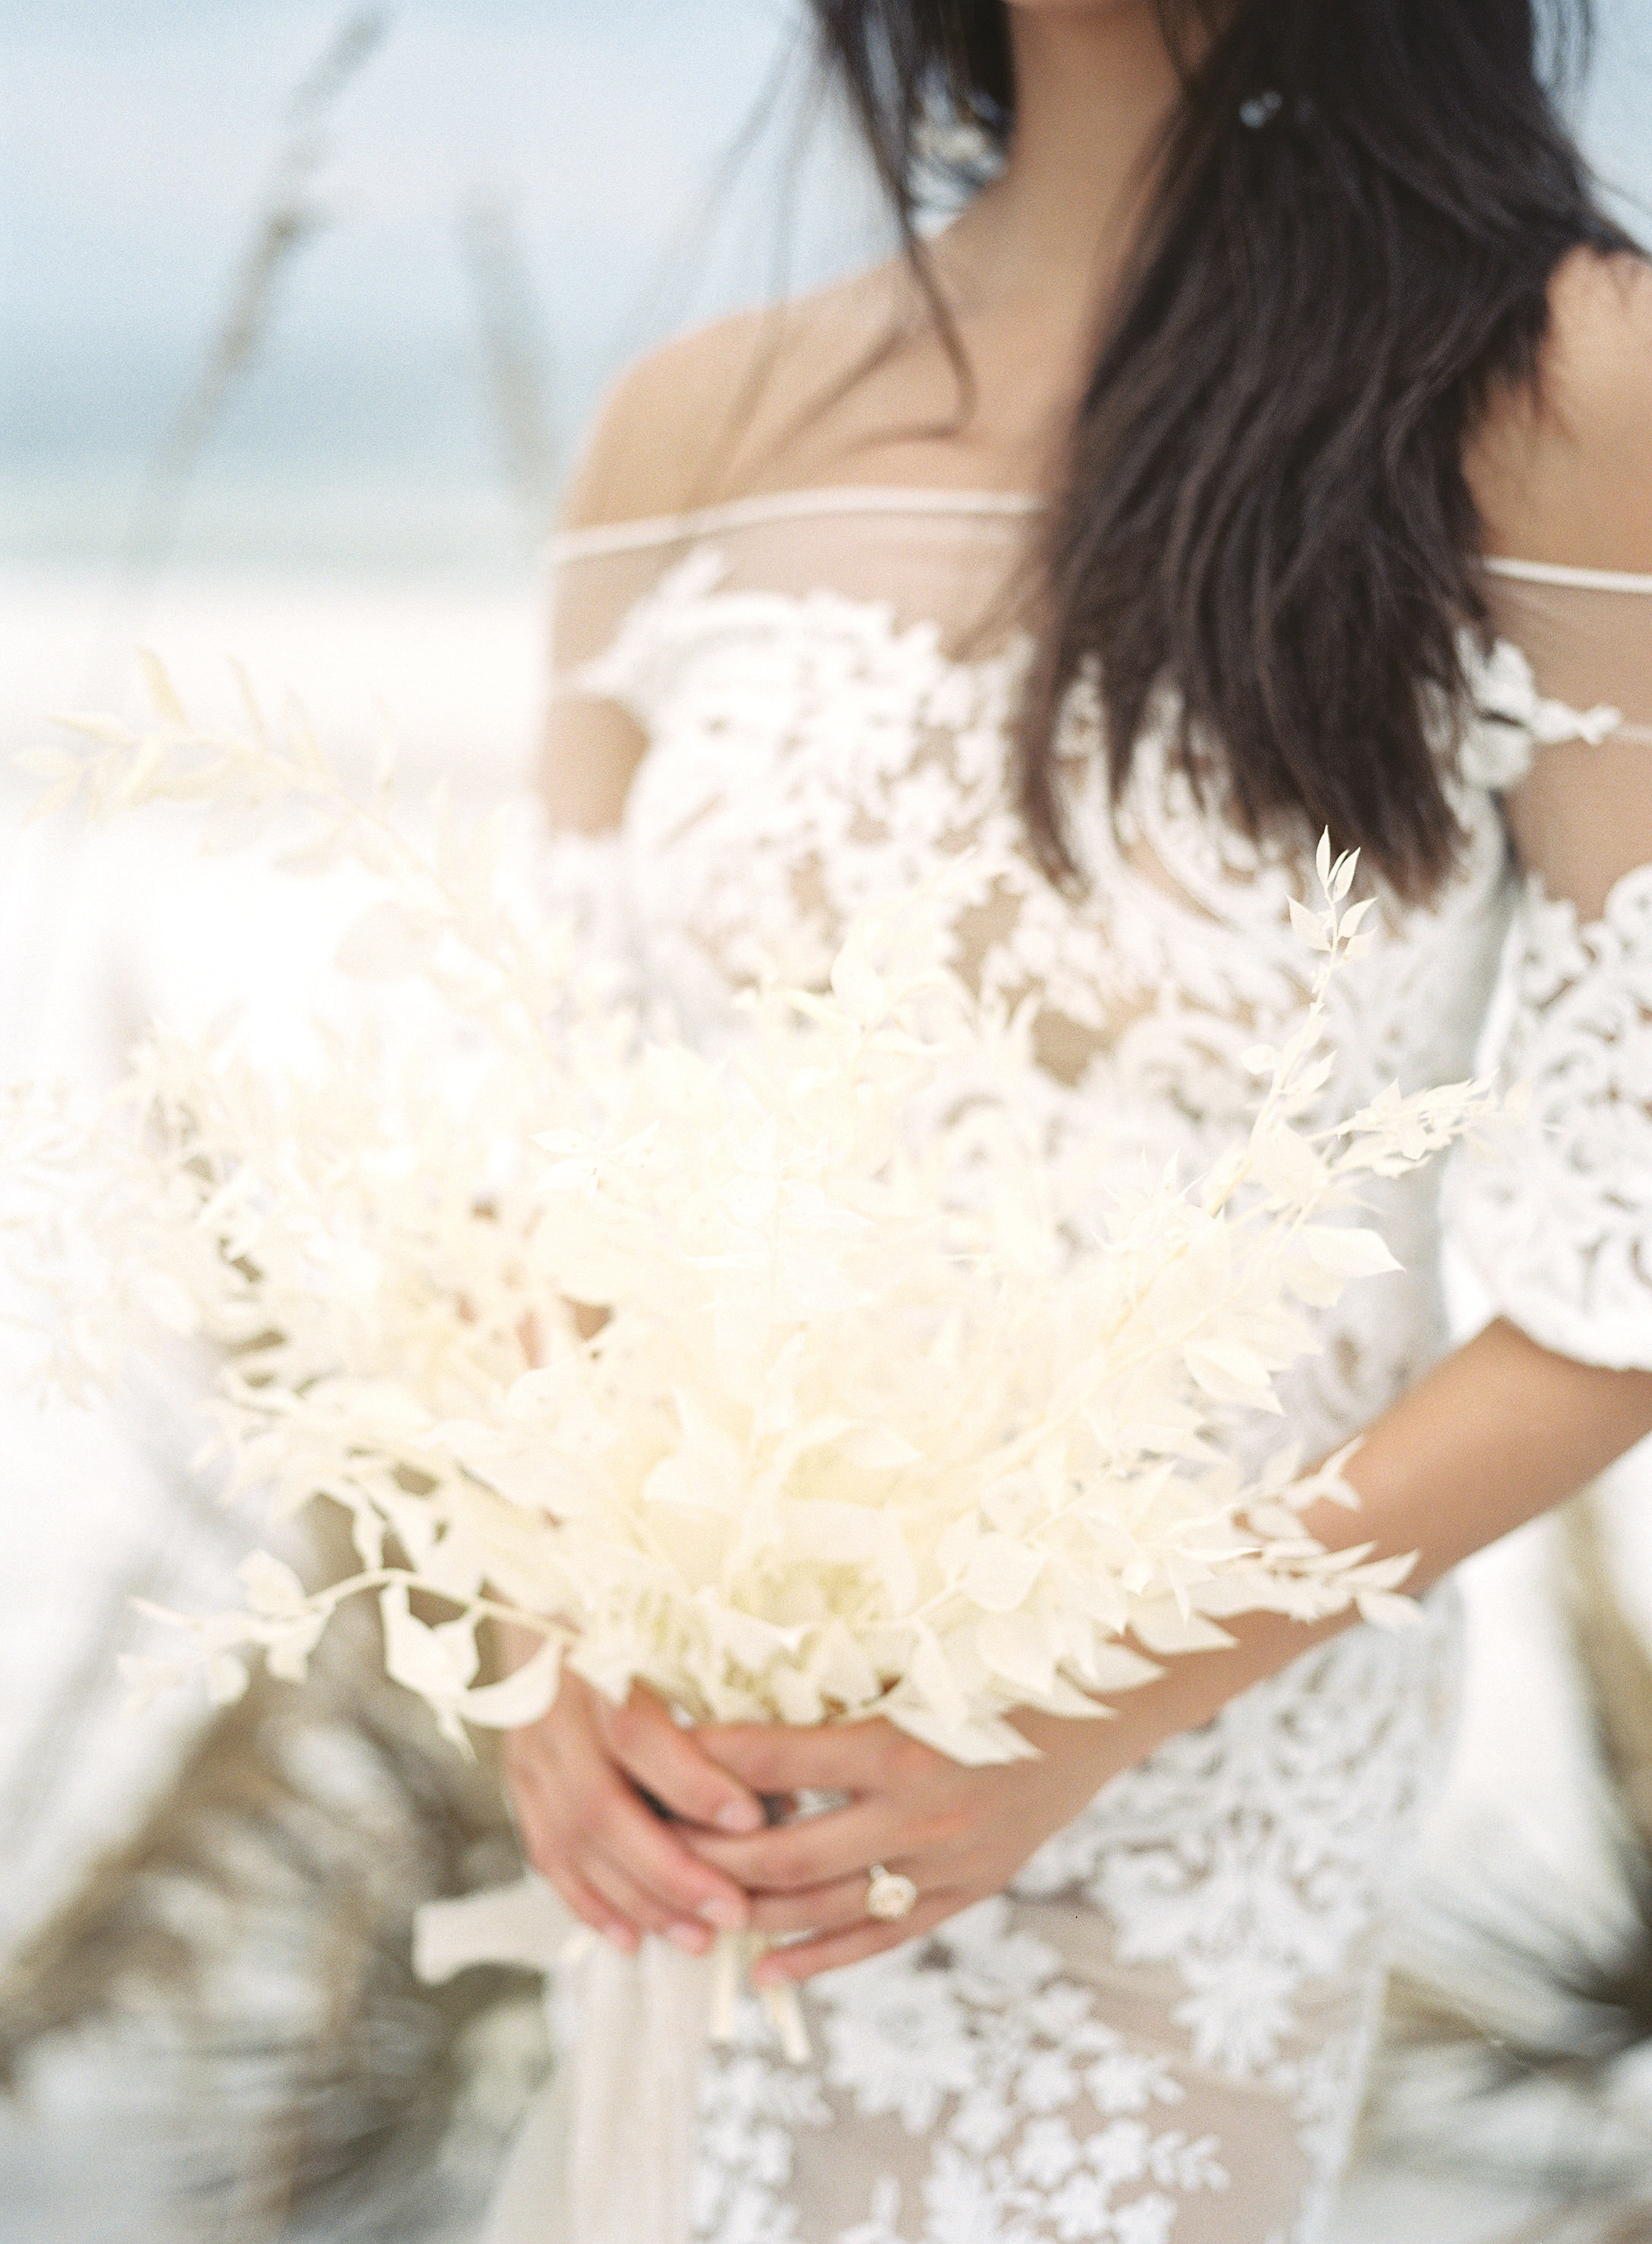 jessica-zimmerman-events-florida-beach-dried-bouquet.jpg